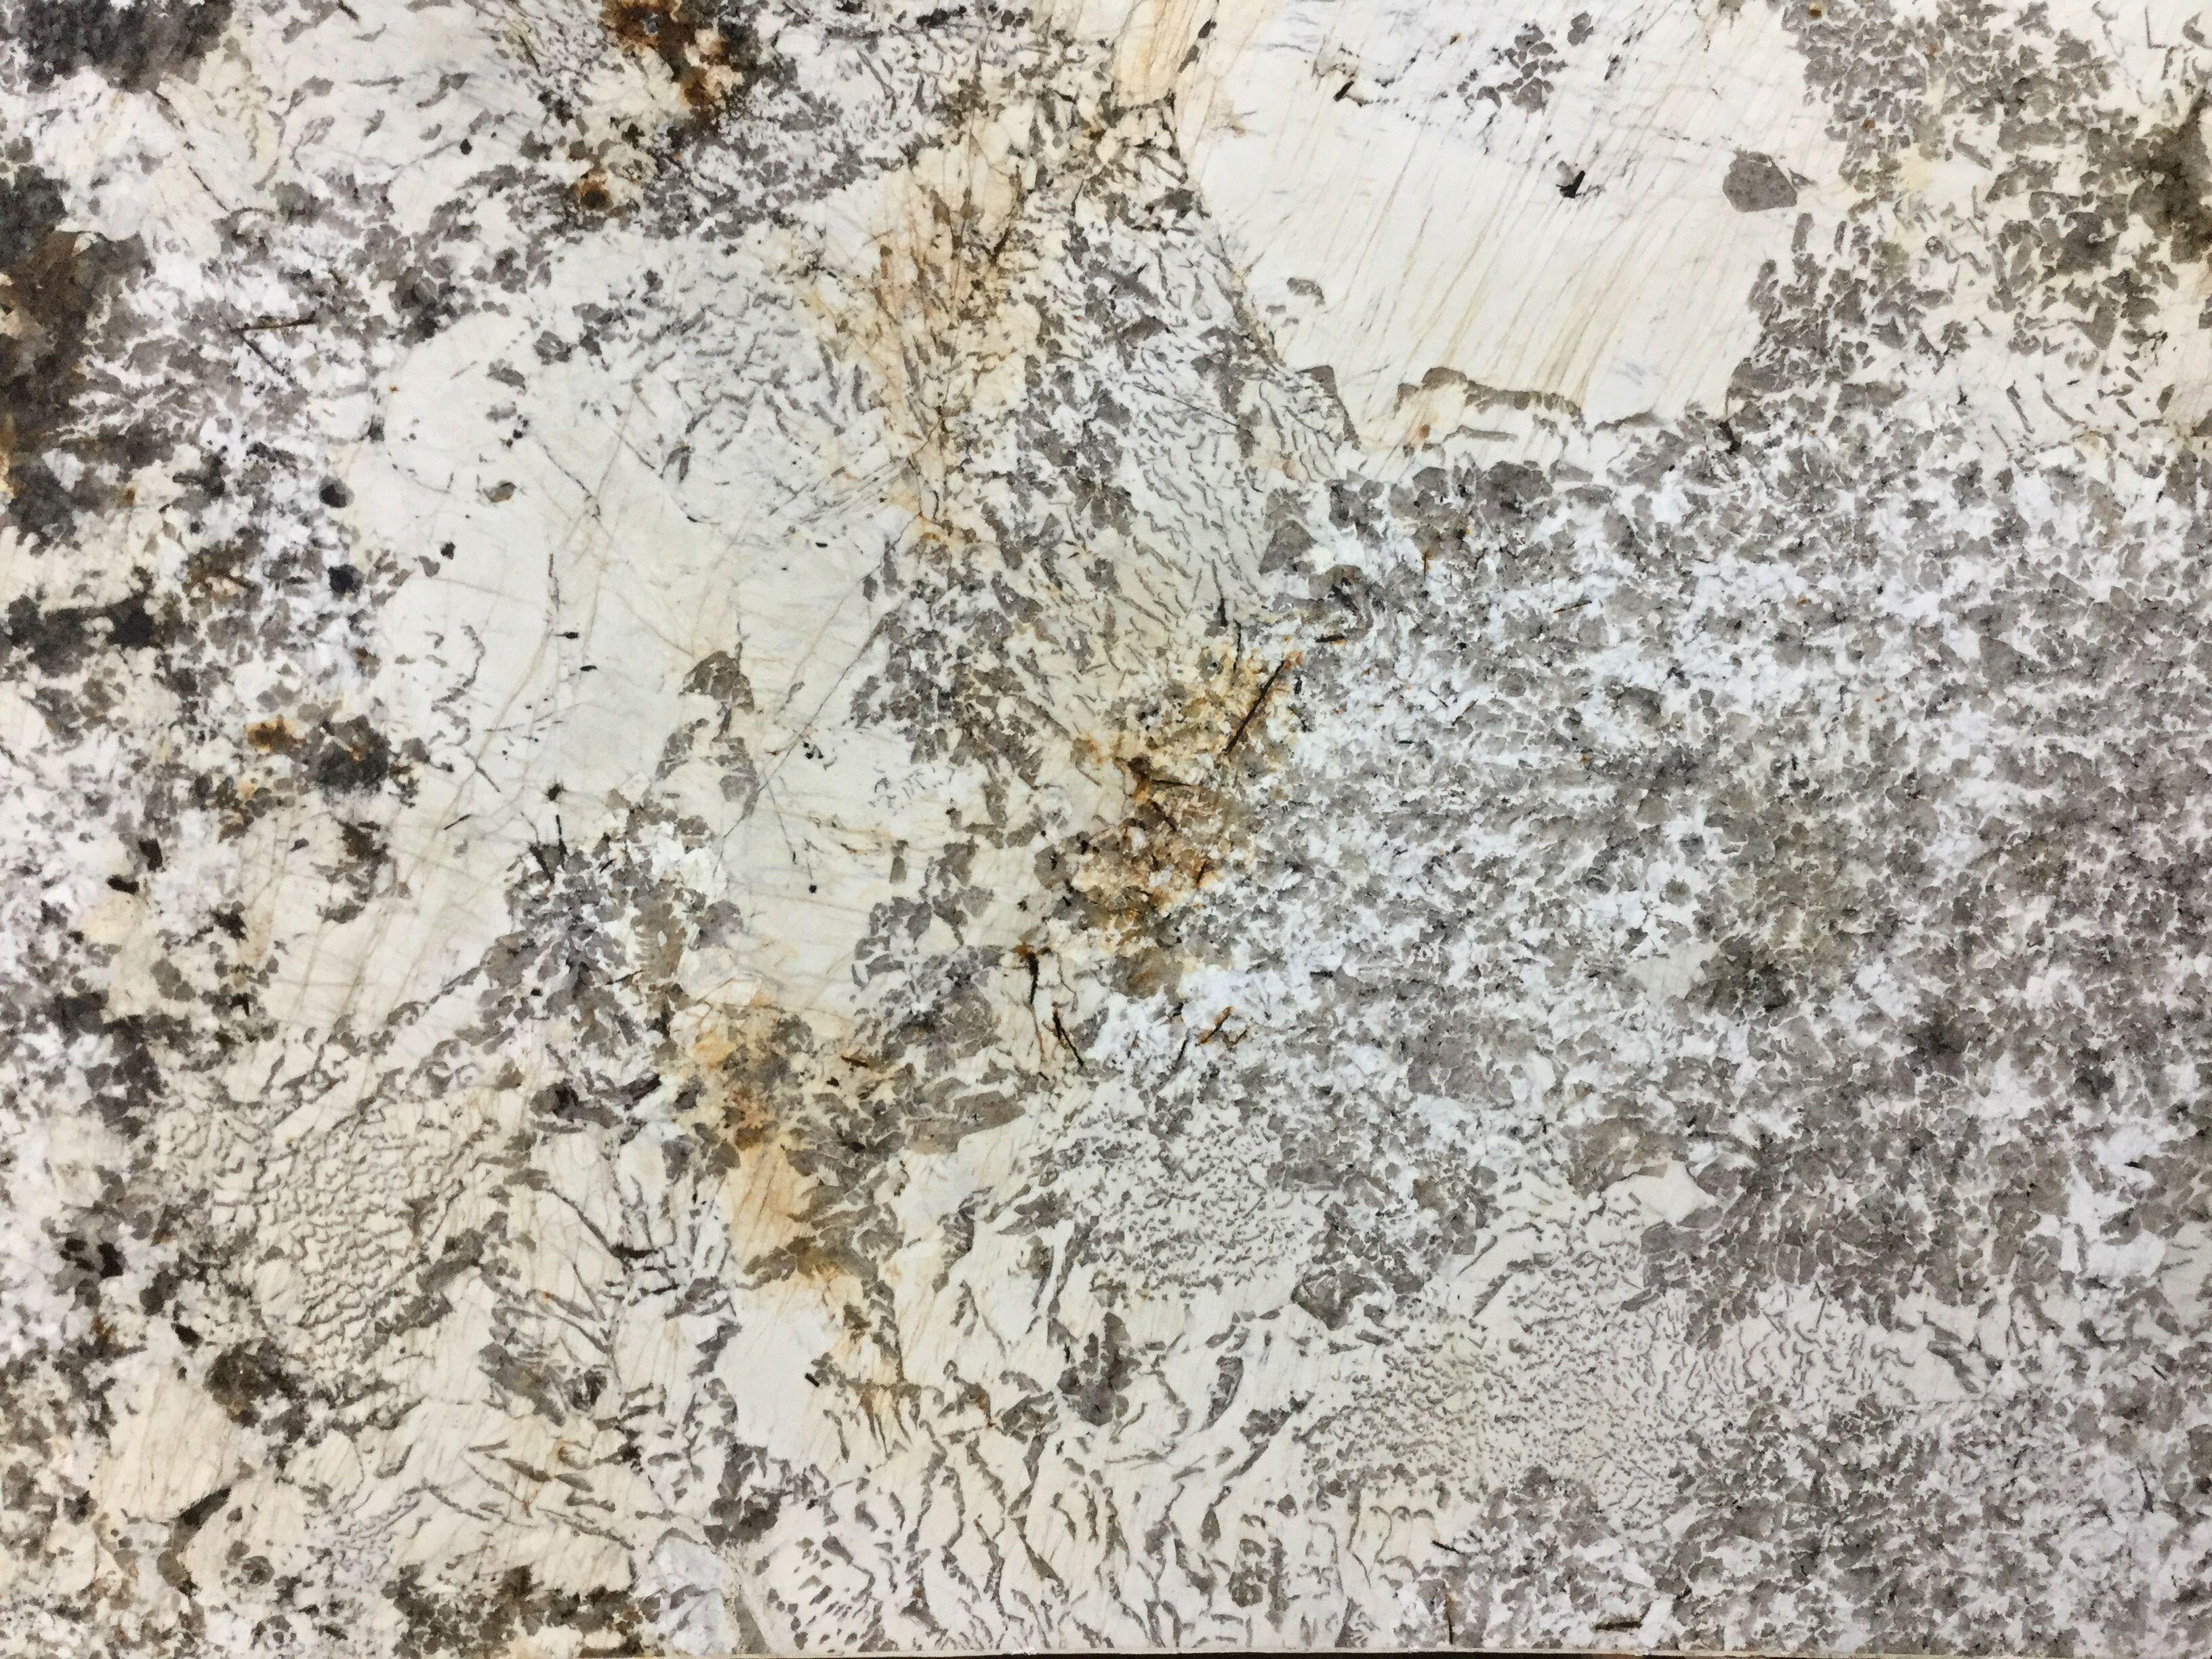 Blanc Du Blanc Special Colors In Granite Countertops Dallas Fort Worth Istone Floors Granite Countertops Flooring Floor Installation